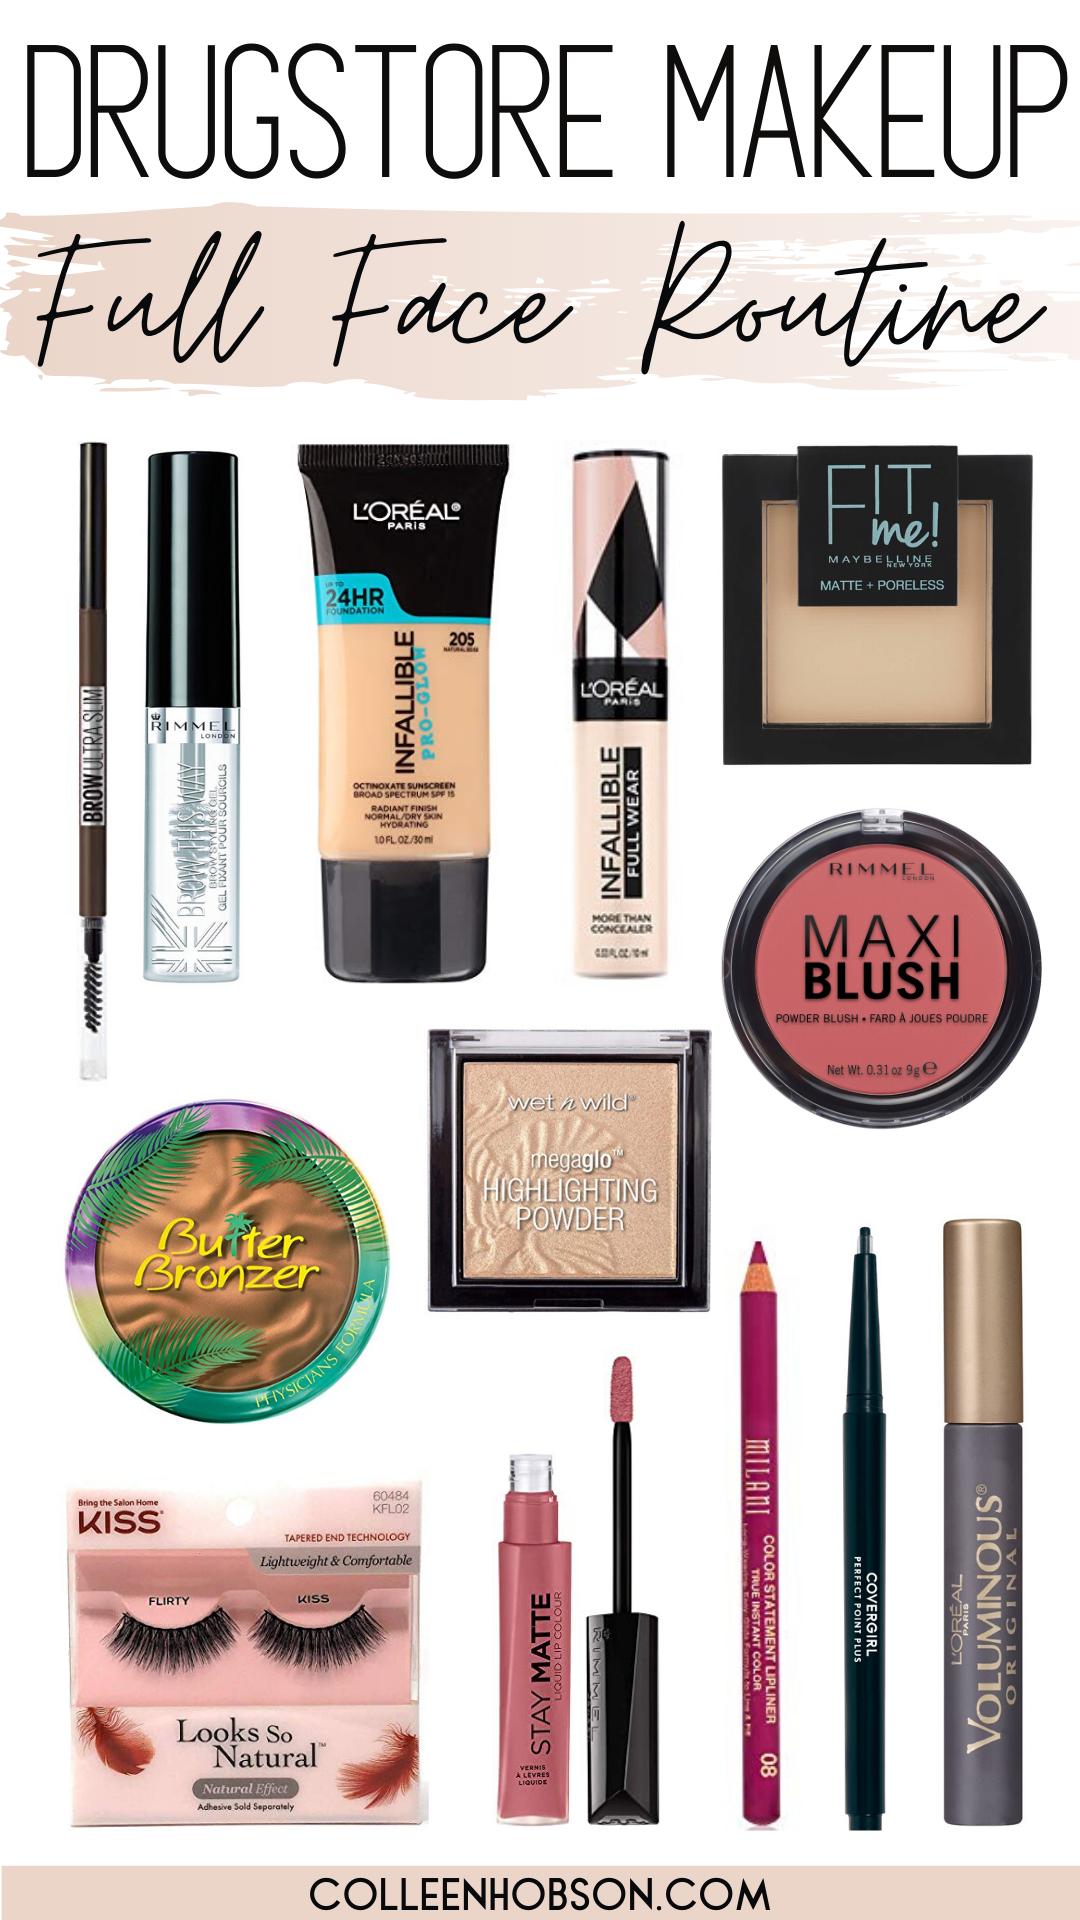 Drugstore Makeup Routine Full Face Tutorial Colleen Hobson In 2020 Drugstore Makeup Drugstore Makeup Tutorial Makeup Hacks Tutorials